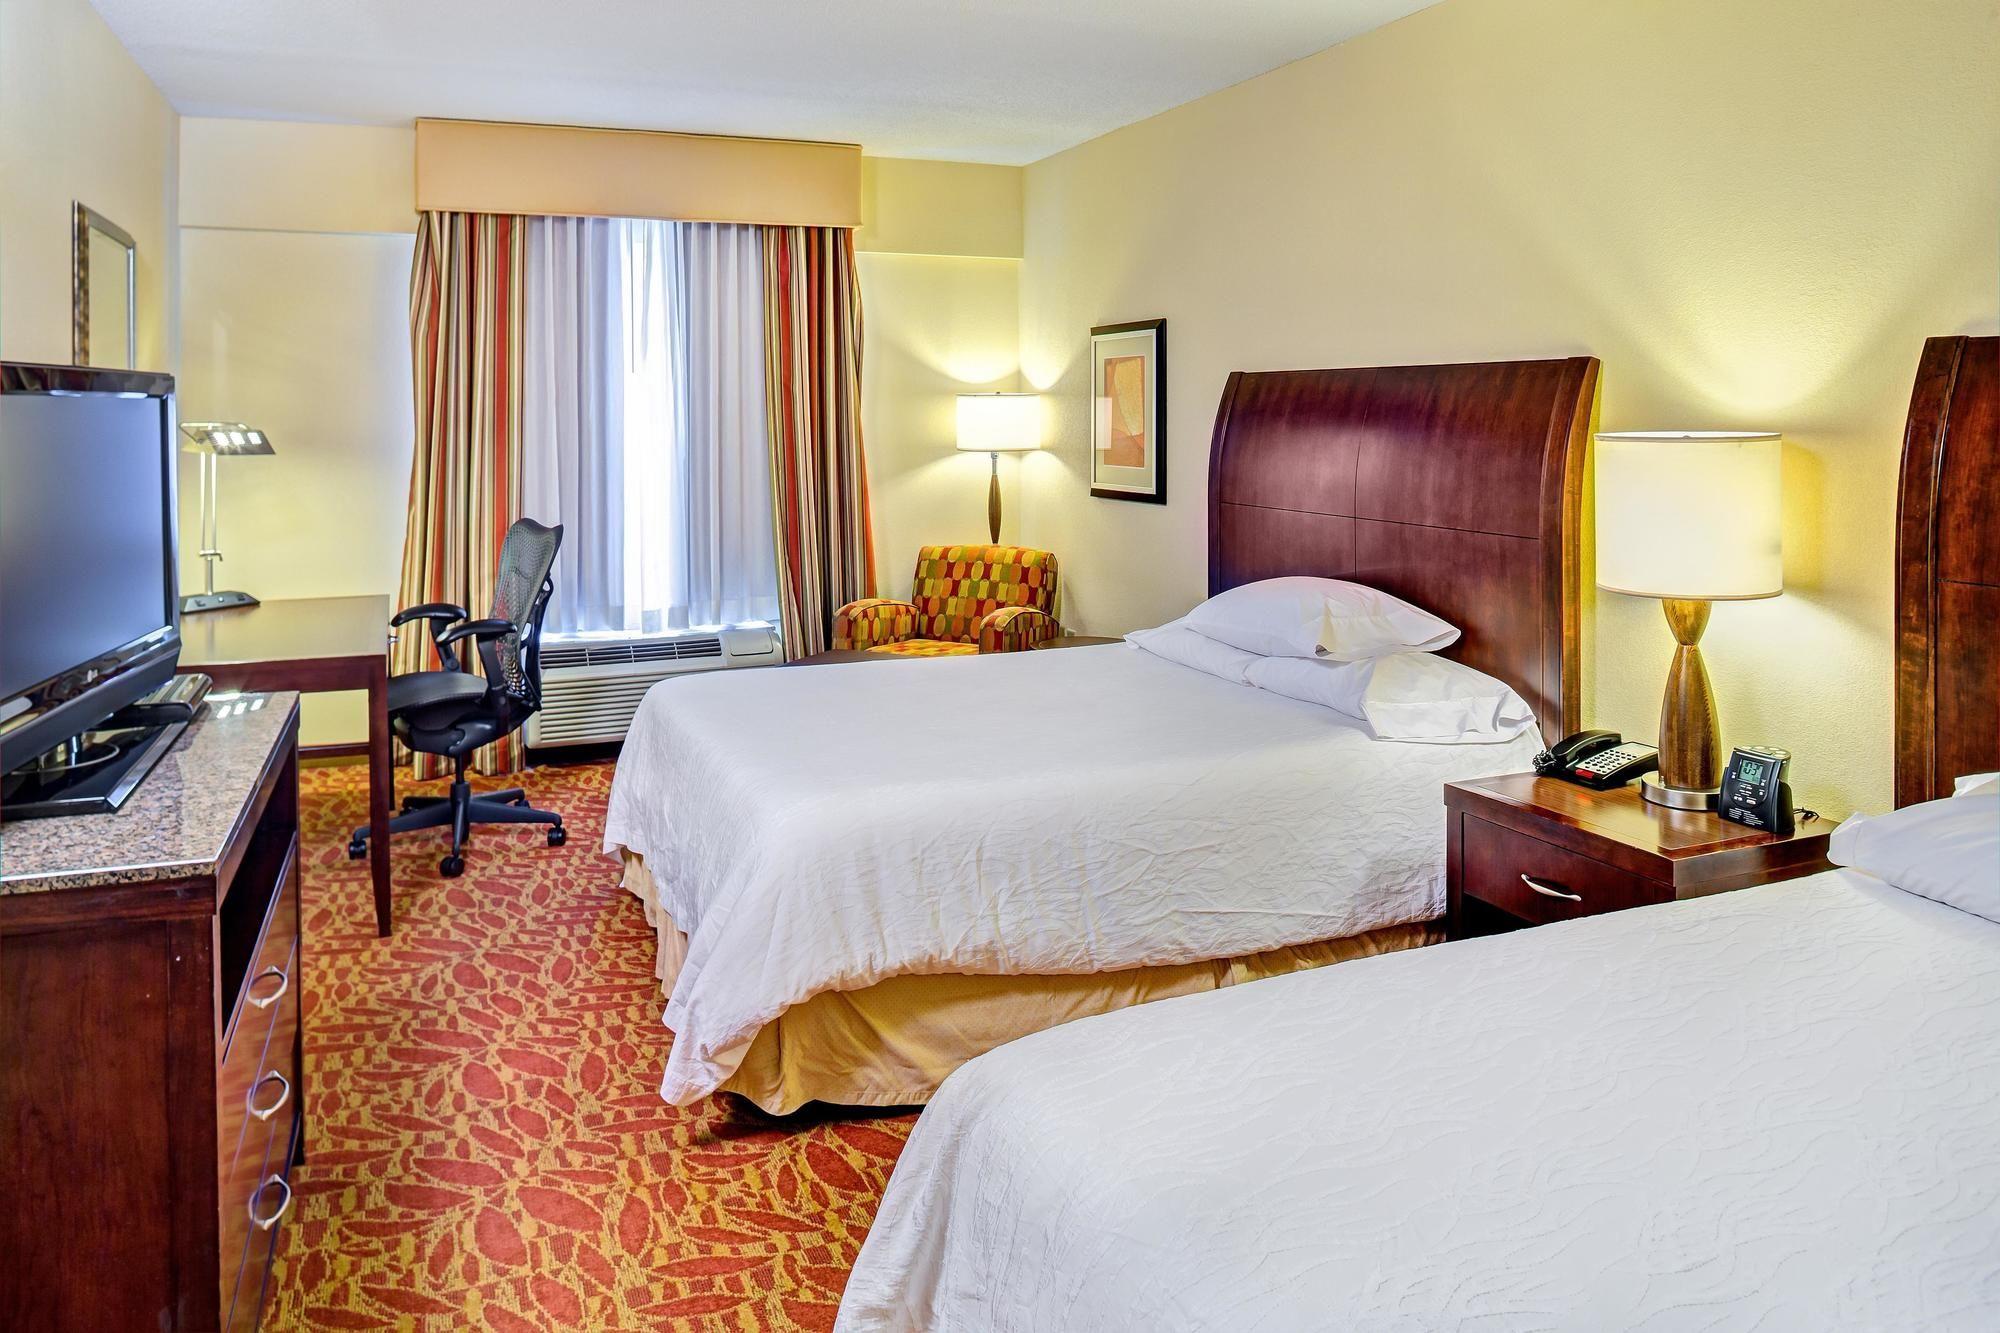 Augusta Hotel Coupons For Augusta Georgia